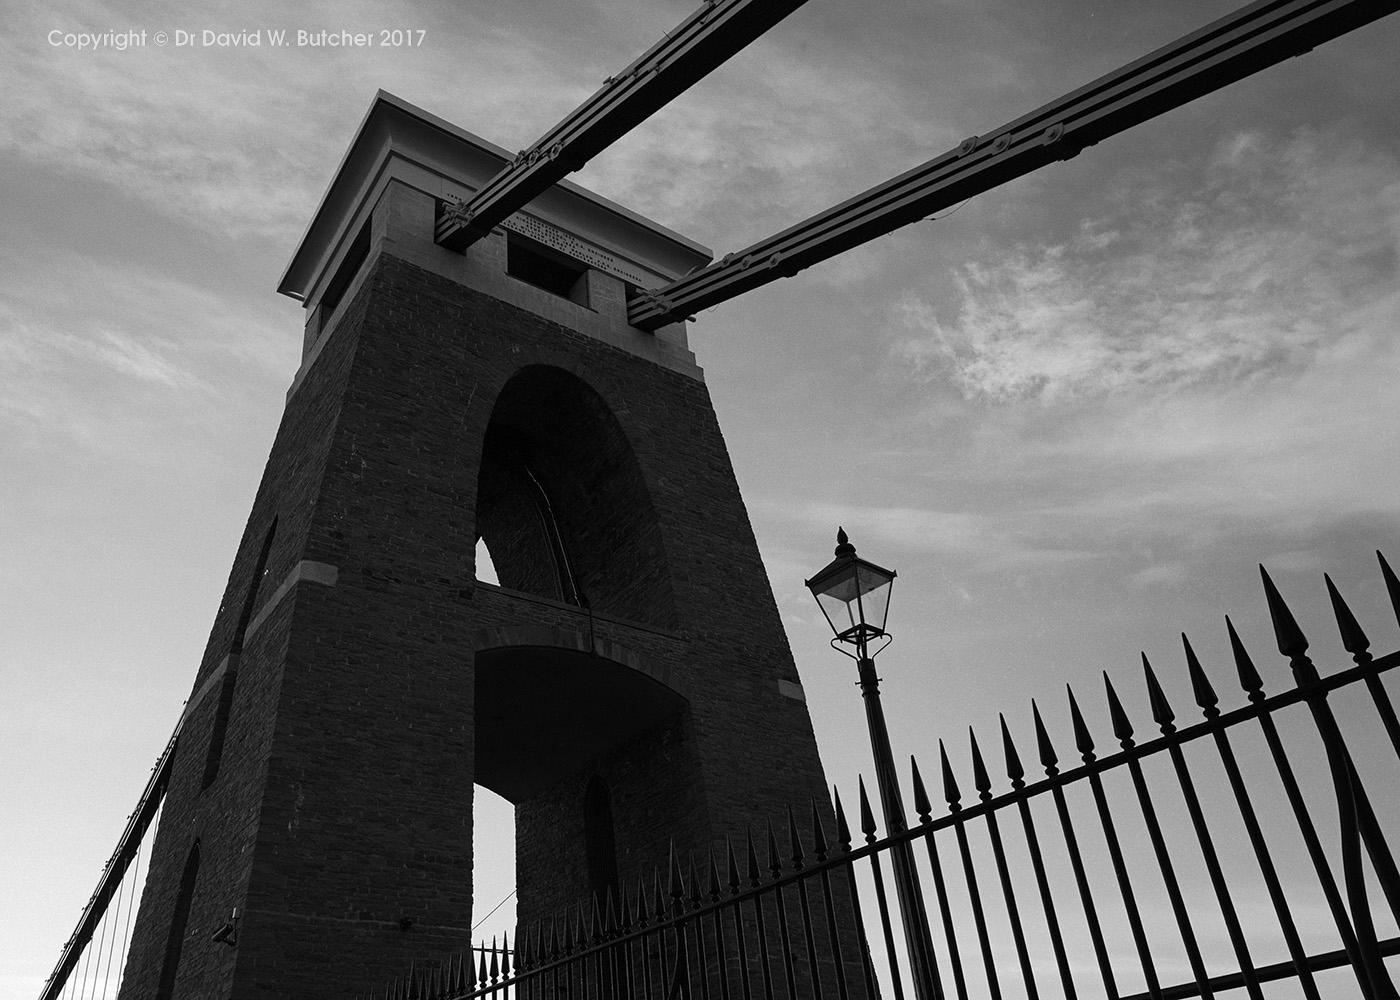 Bristol Clifton Suspension Bridge Tower at Dusk, England